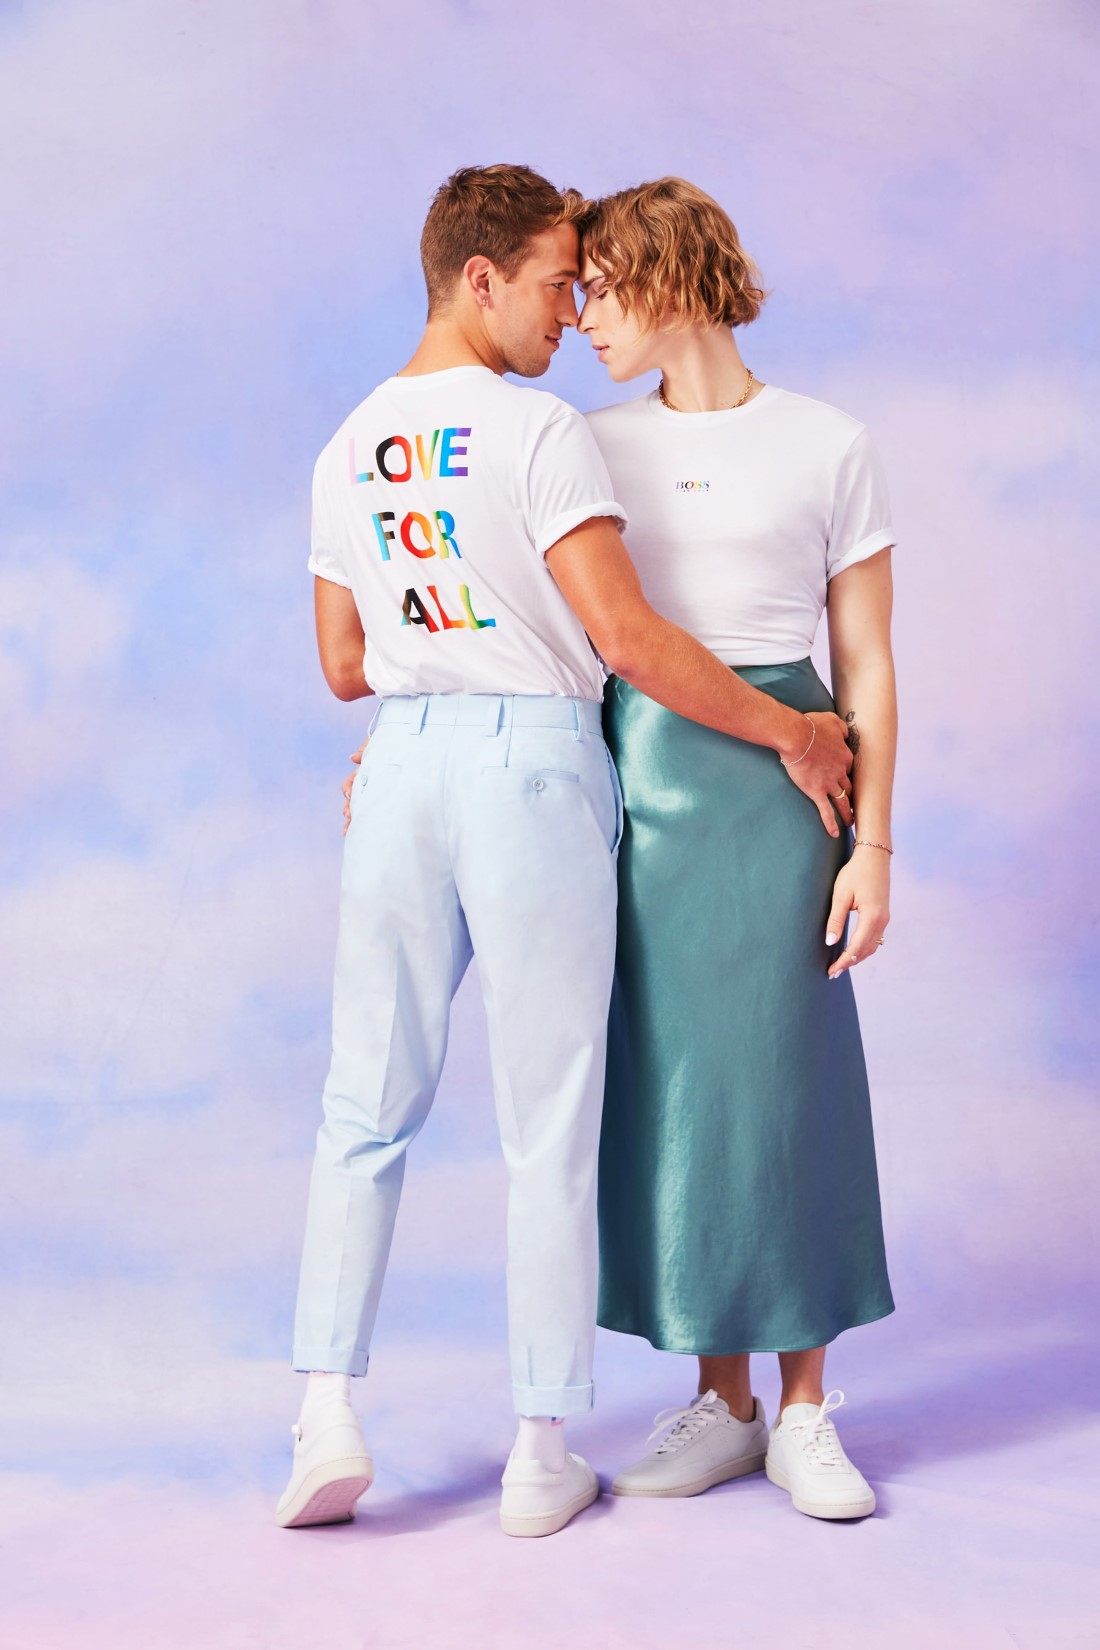 BOSS Pride 2021 Campagne - Tommy Dorfman & Peter Zurkuhlen